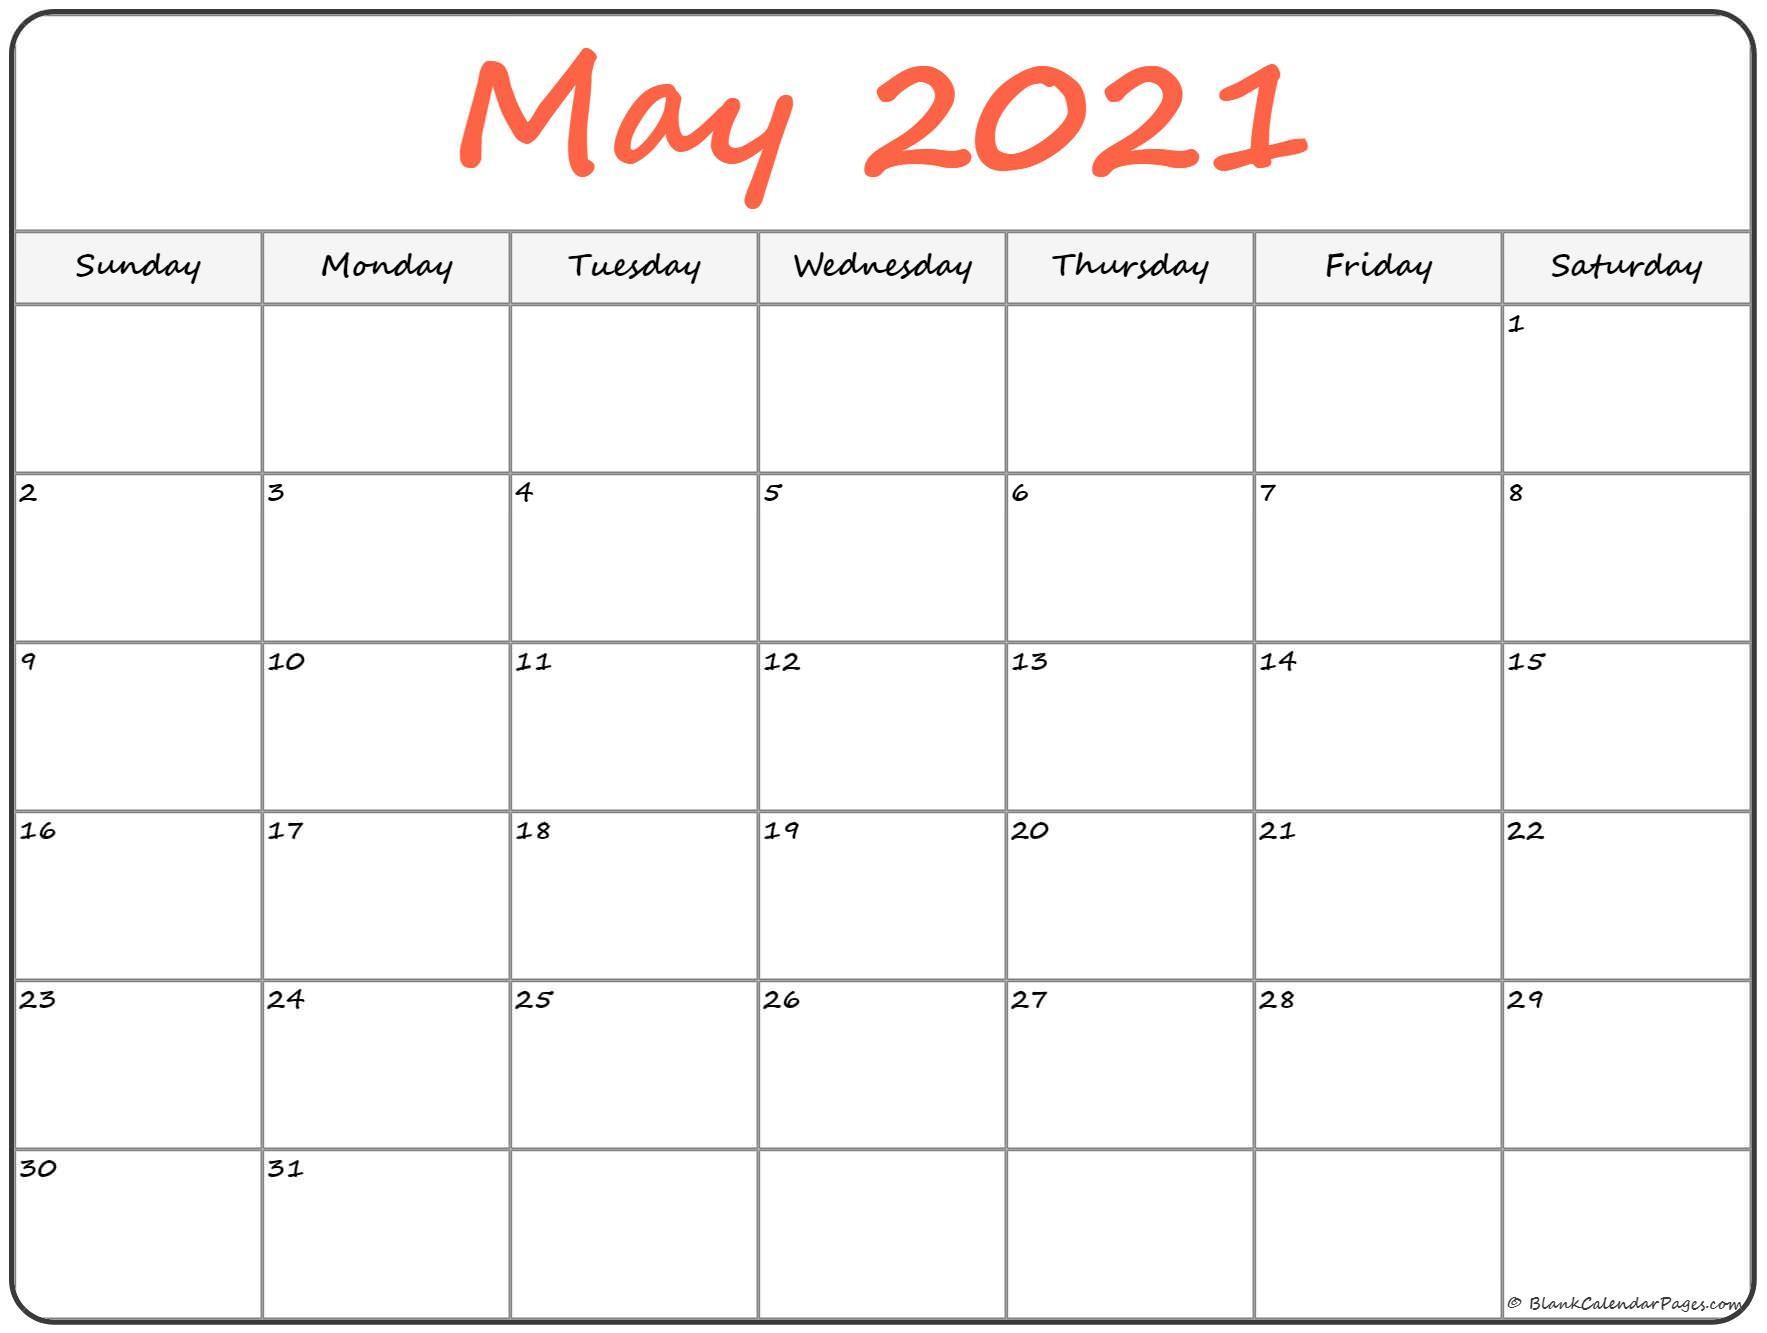 2021 Editable Calendar February March April May   Free With Regard To 2021 Calendar March April May